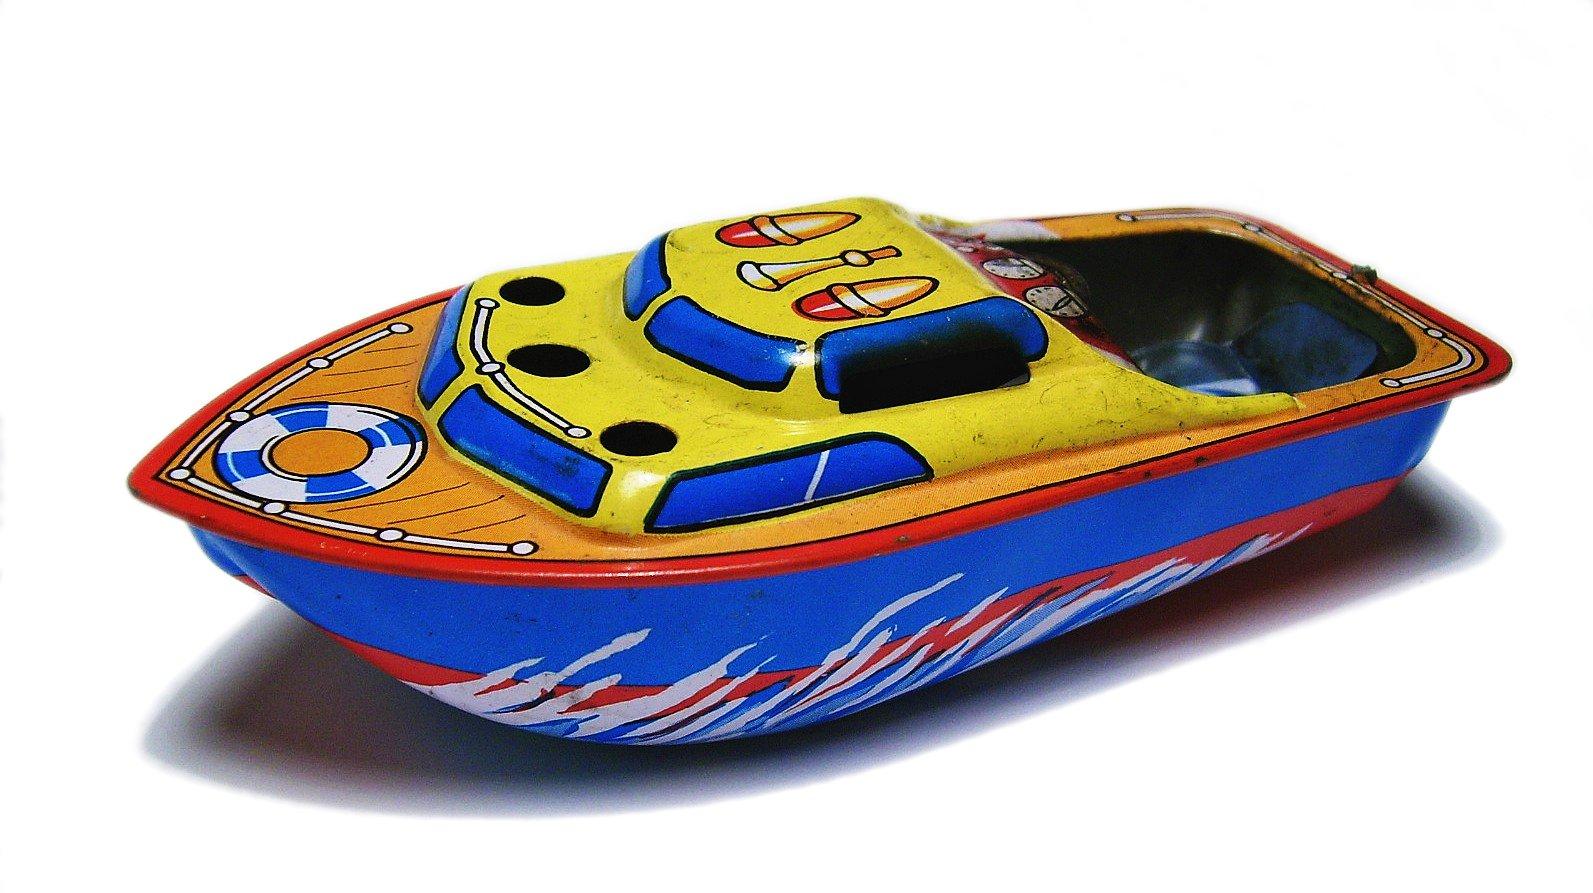 Modern Kids Boat Toys Mold - Bathroom and Shower Ideas - purosion.com